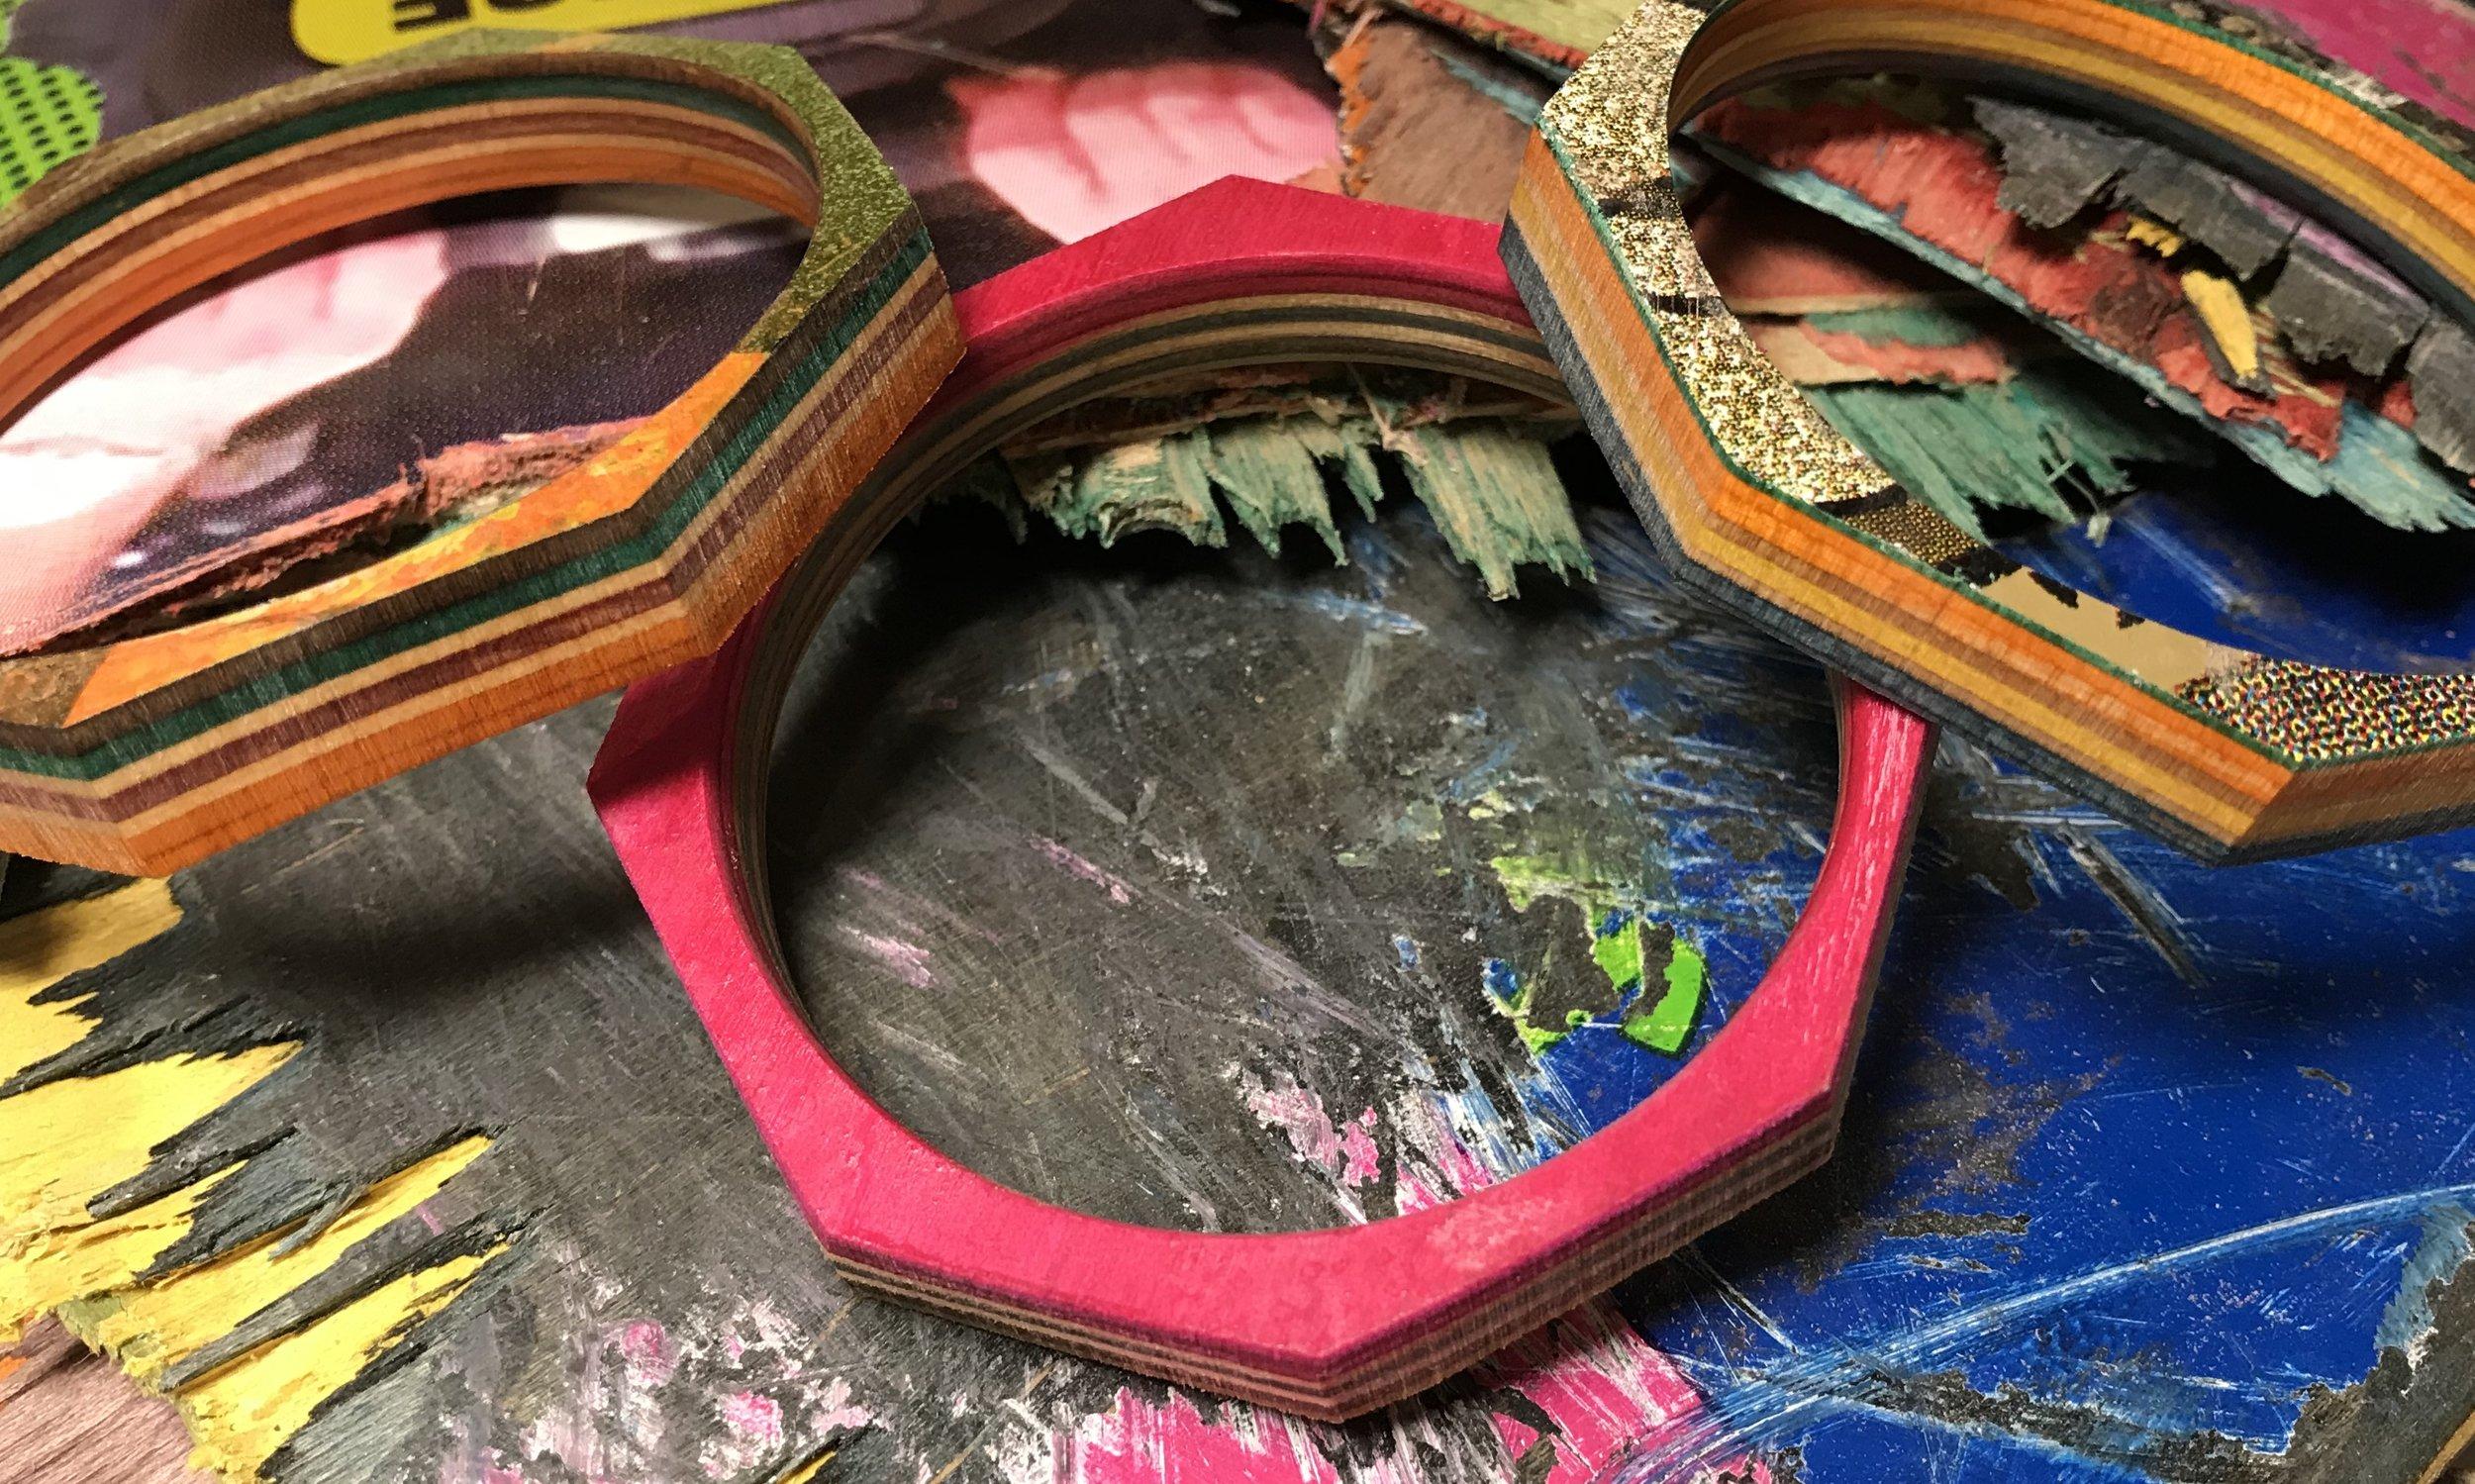 Geometric Bangles  Recycled Skateboard  8 x 8 cm, internal diameter 6.5 x 6.5 cm  £20 each